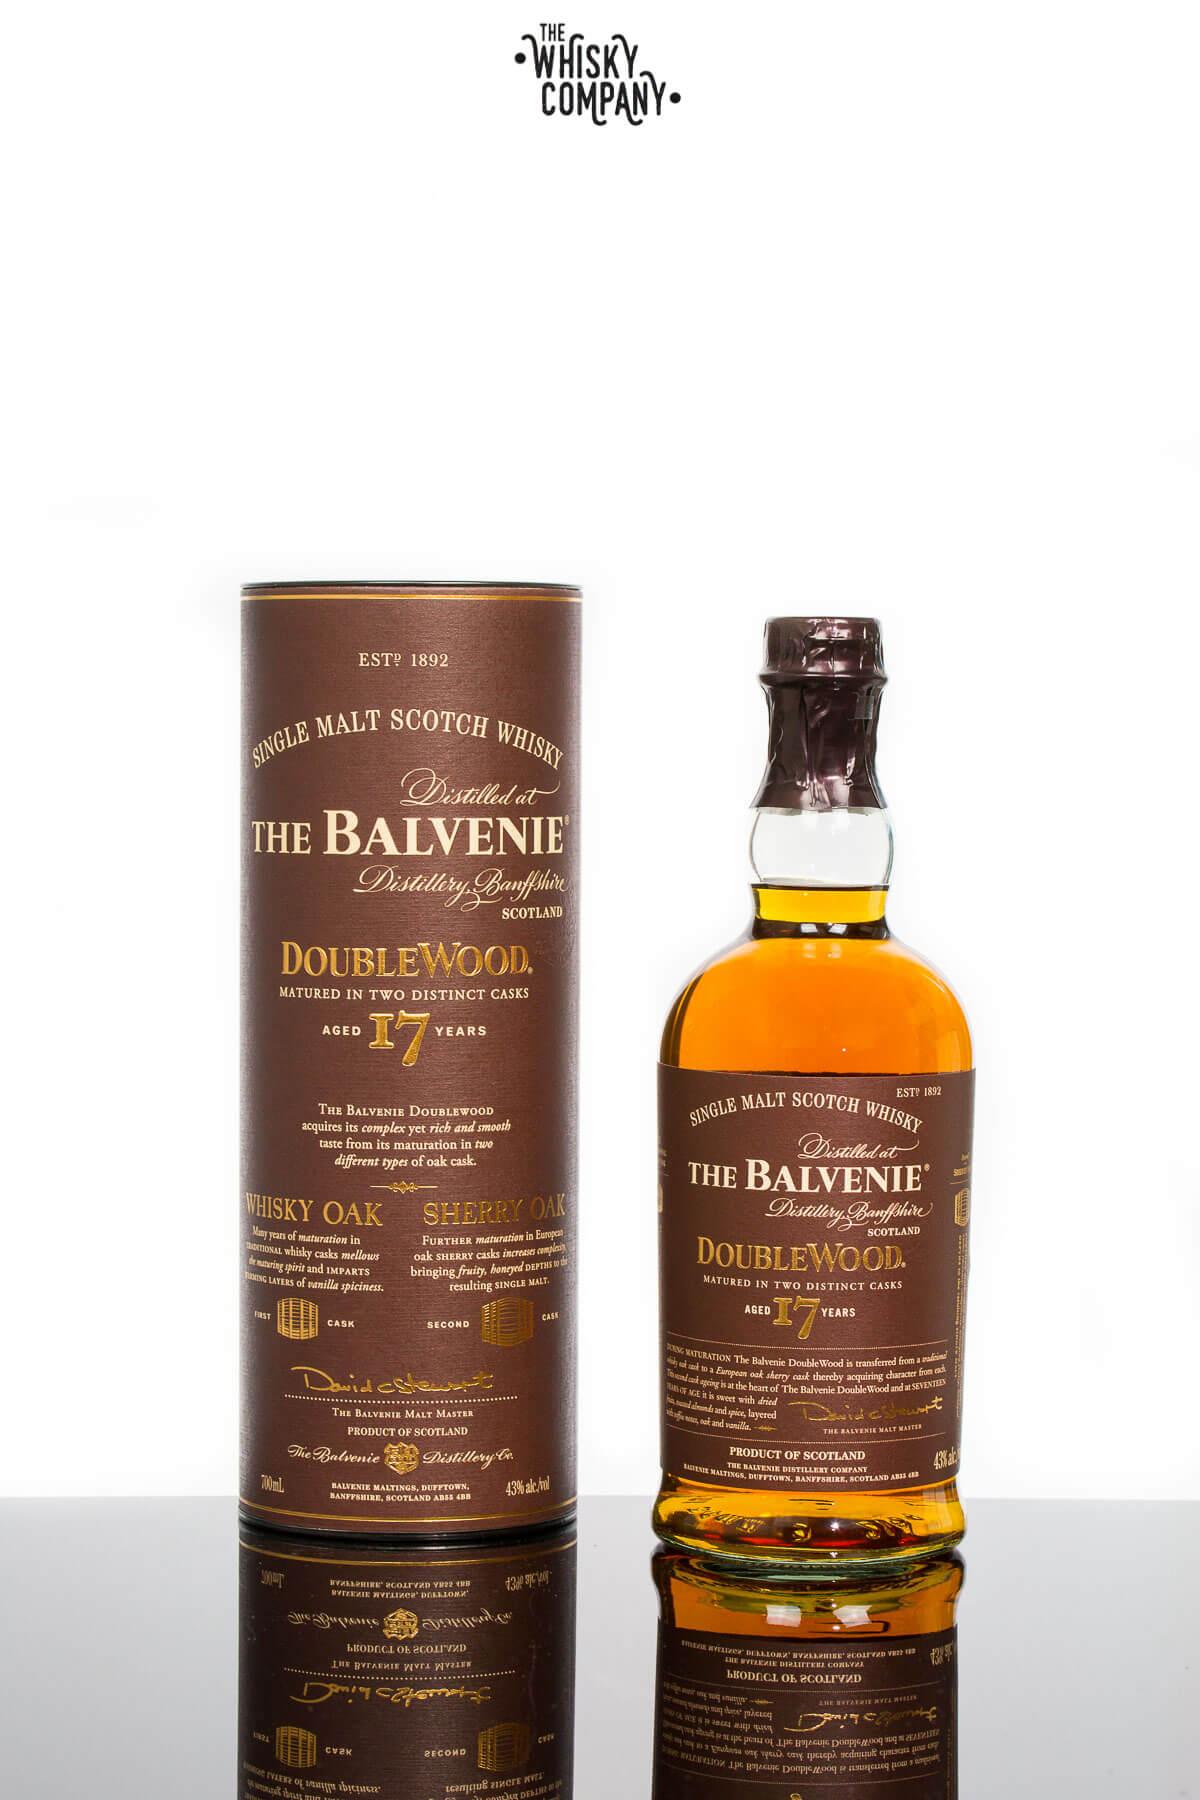 Balvenie single malt scotch